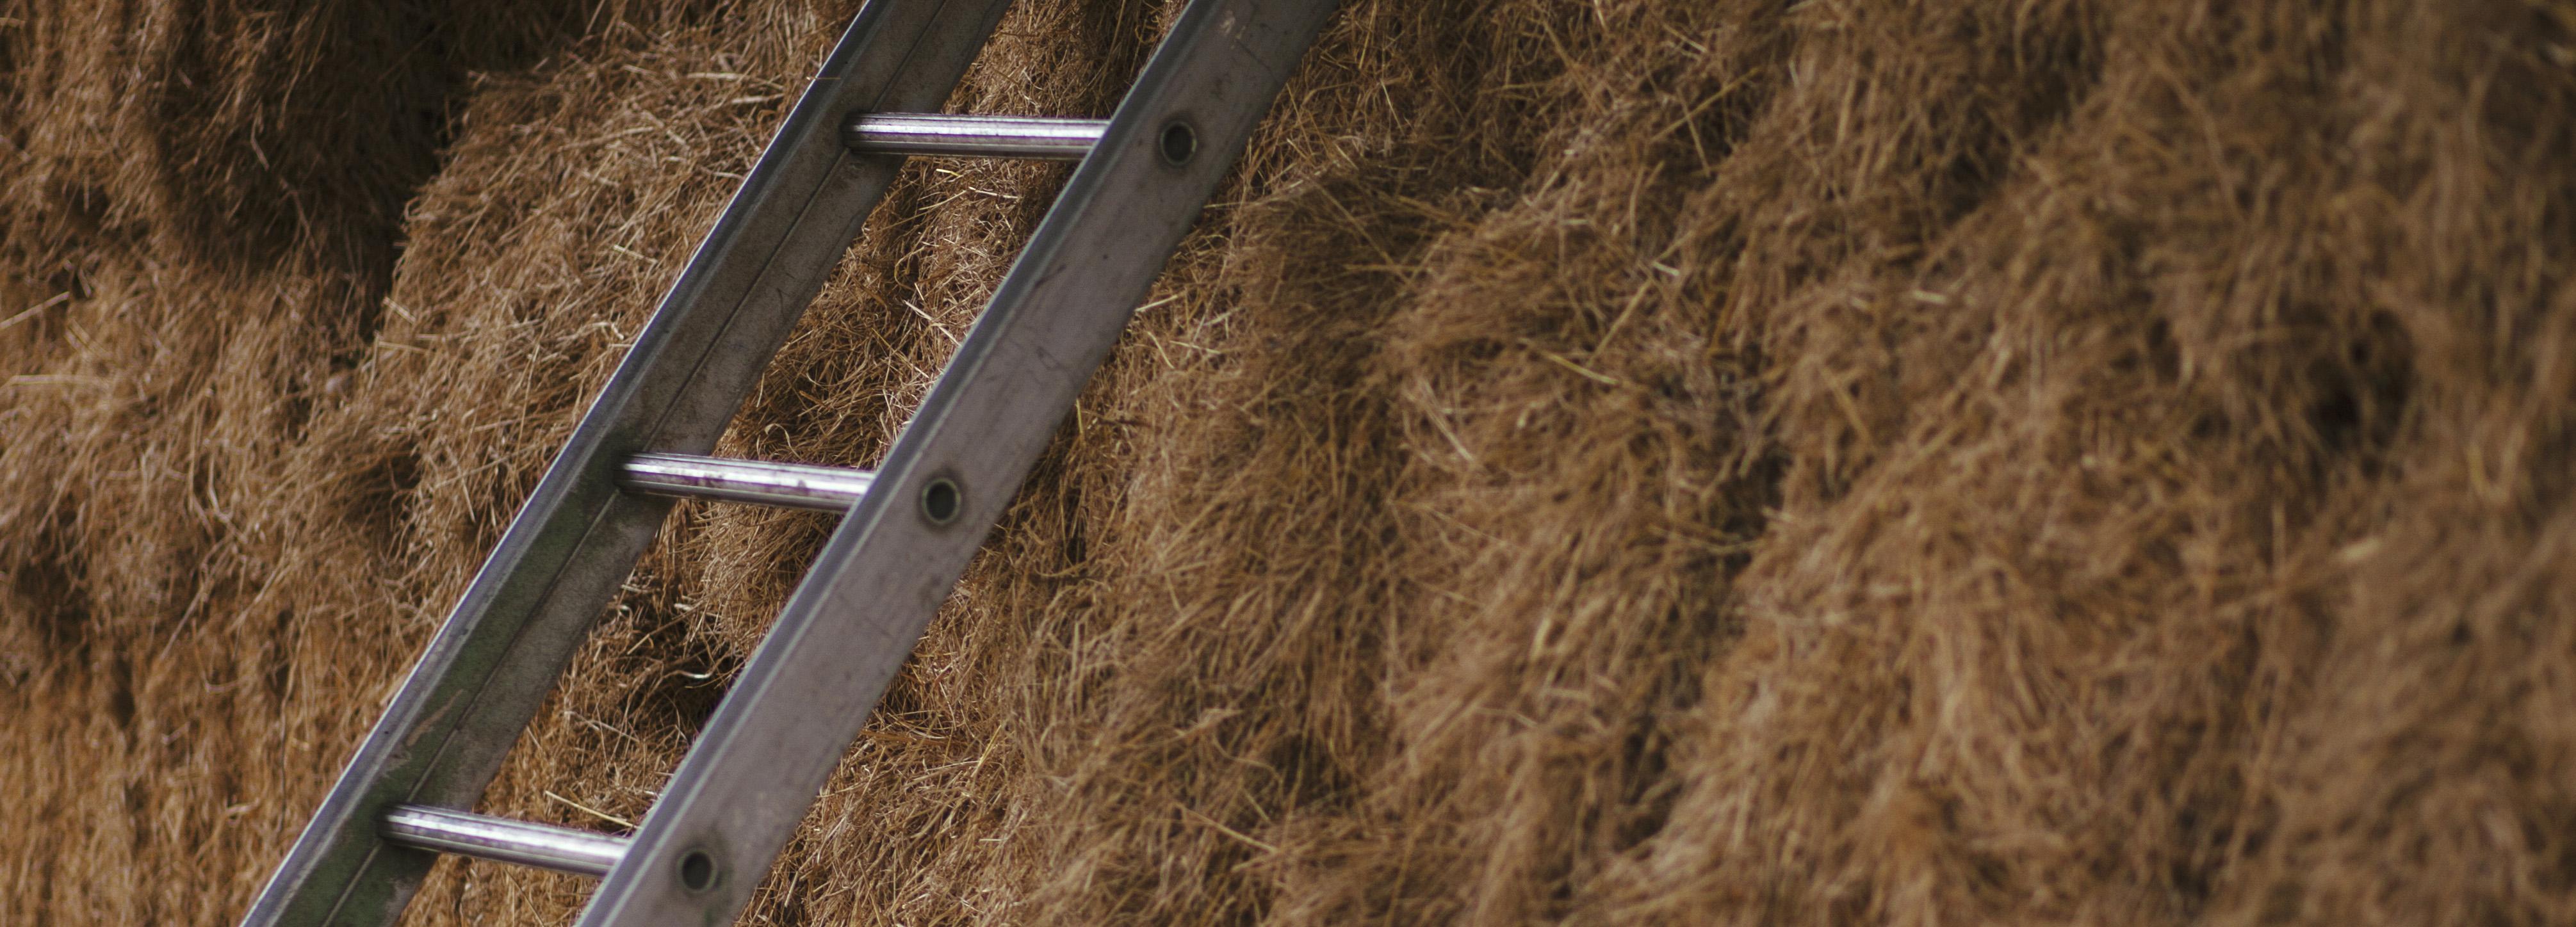 Hay & ladder.jpg 500x 180